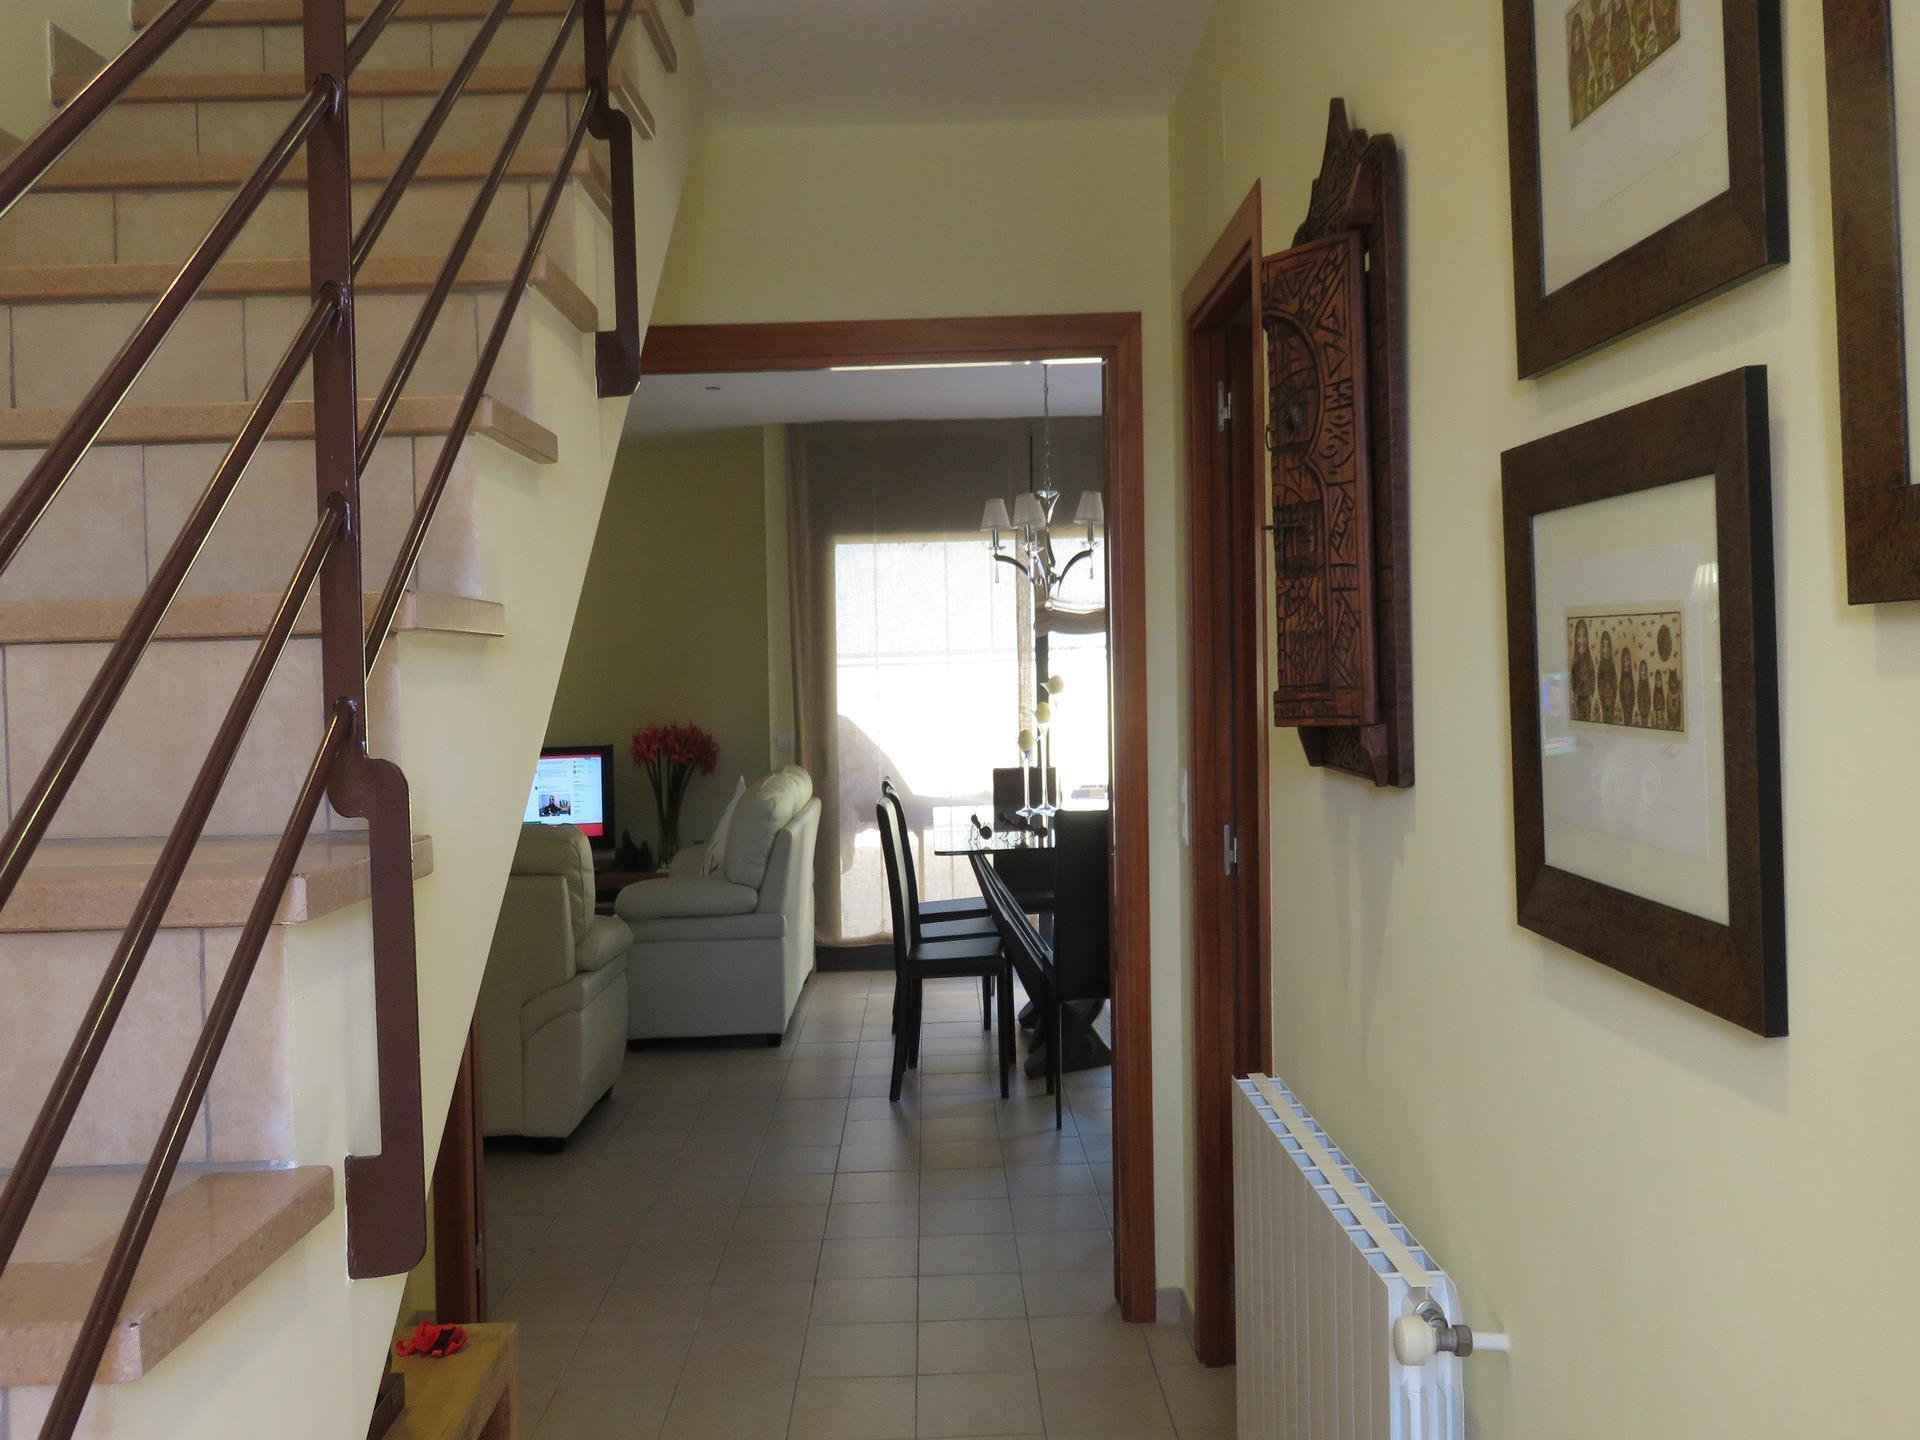 Maison -                               Ulla -                               4 chambres -                               0 occupants